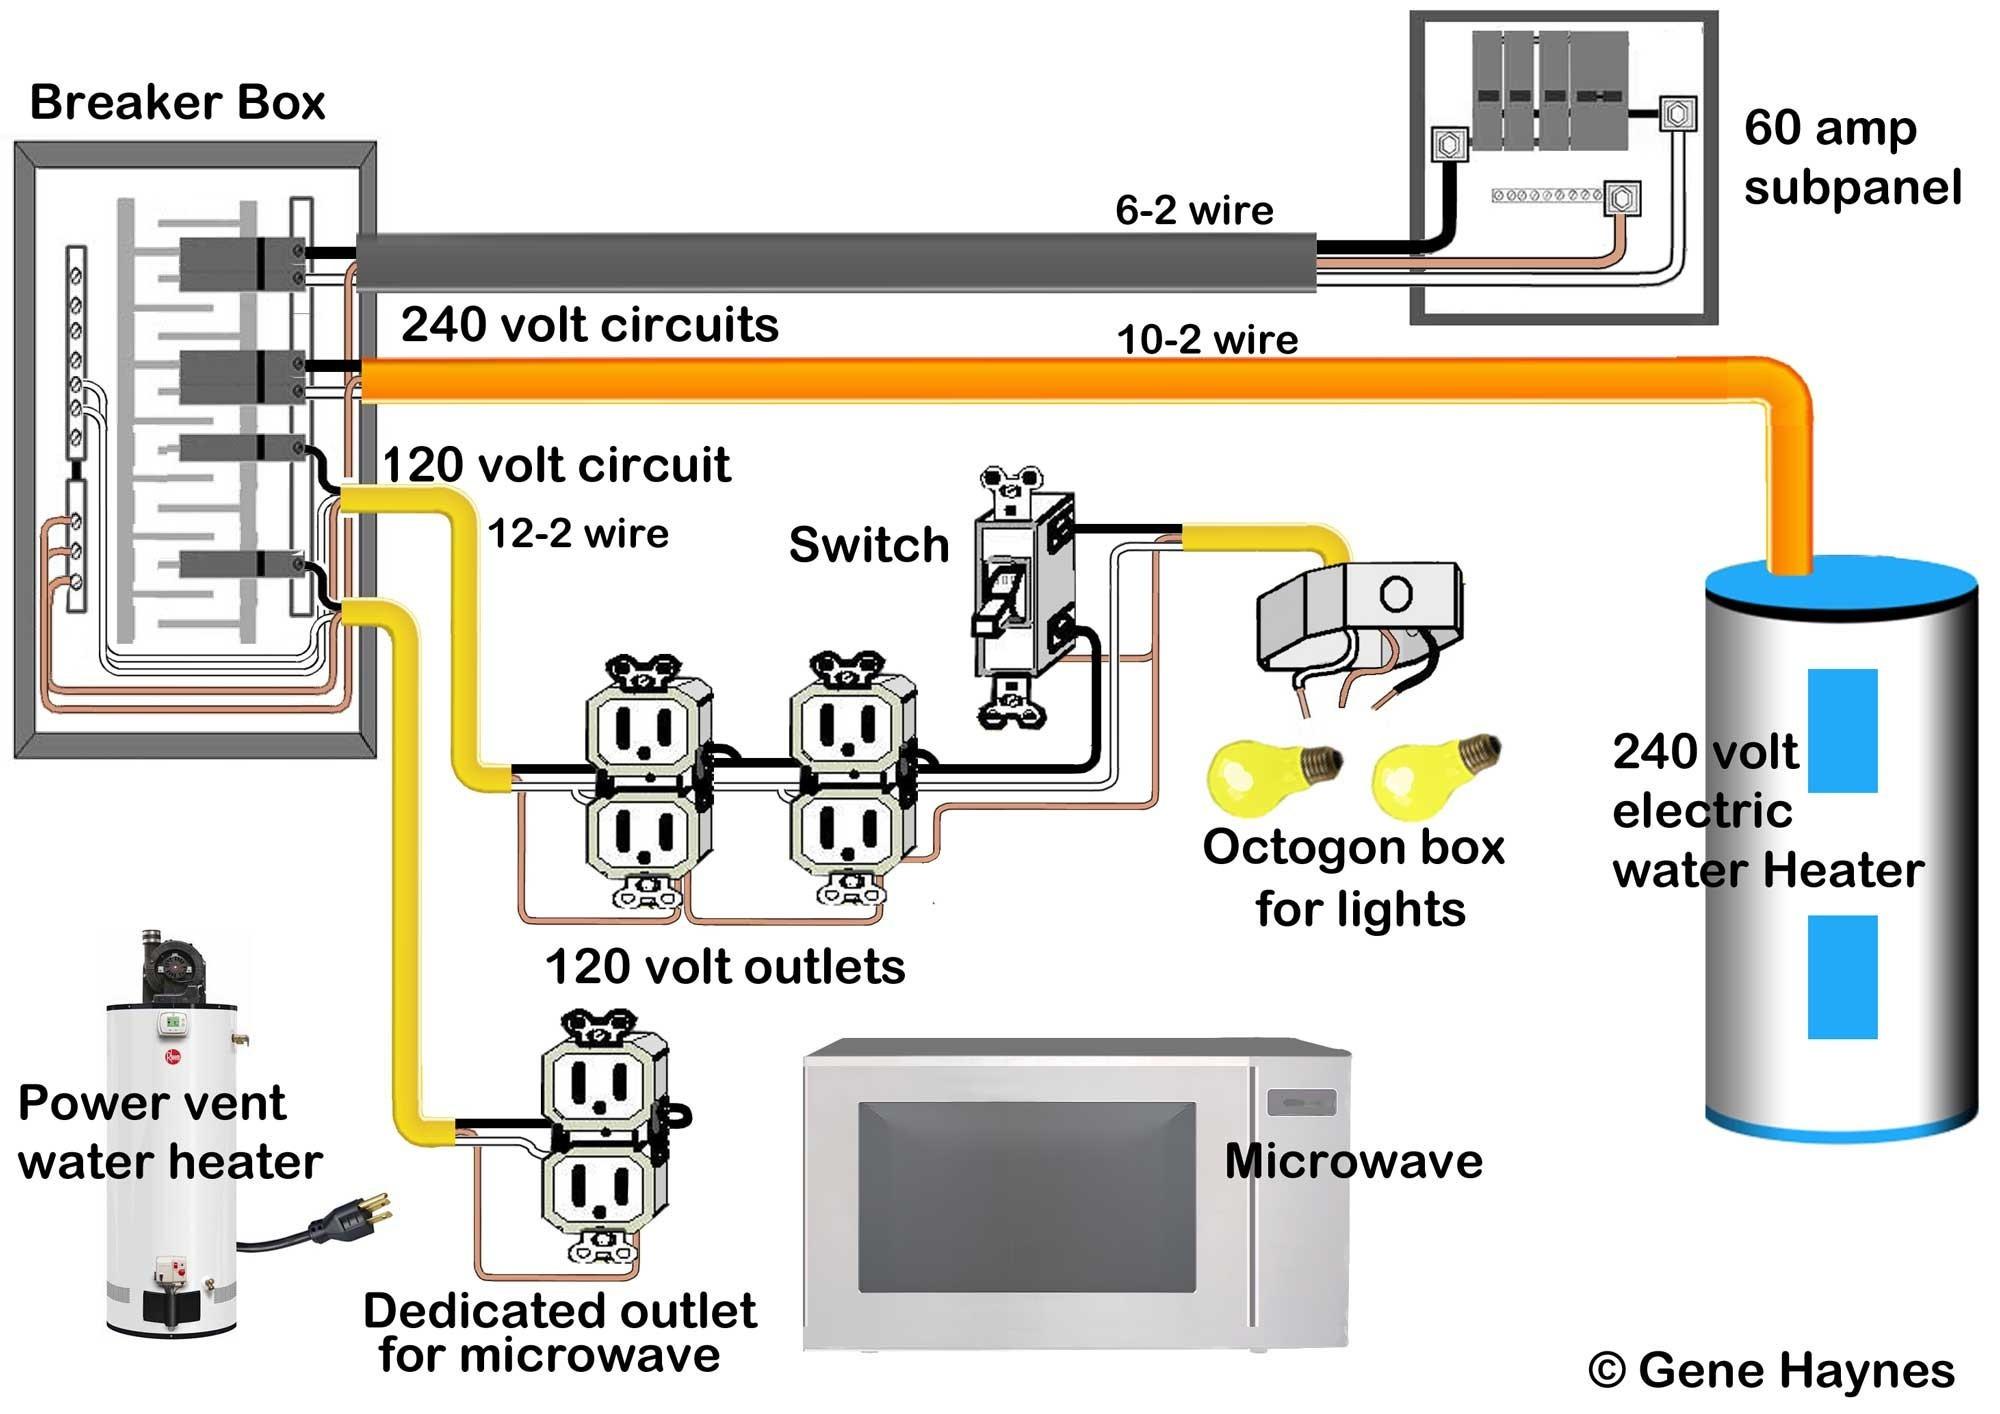 100 Amp Sub Panel Box Wiring Diagram | Wiring Diagram - 100 Amp Sub Panel Wiring Diagram